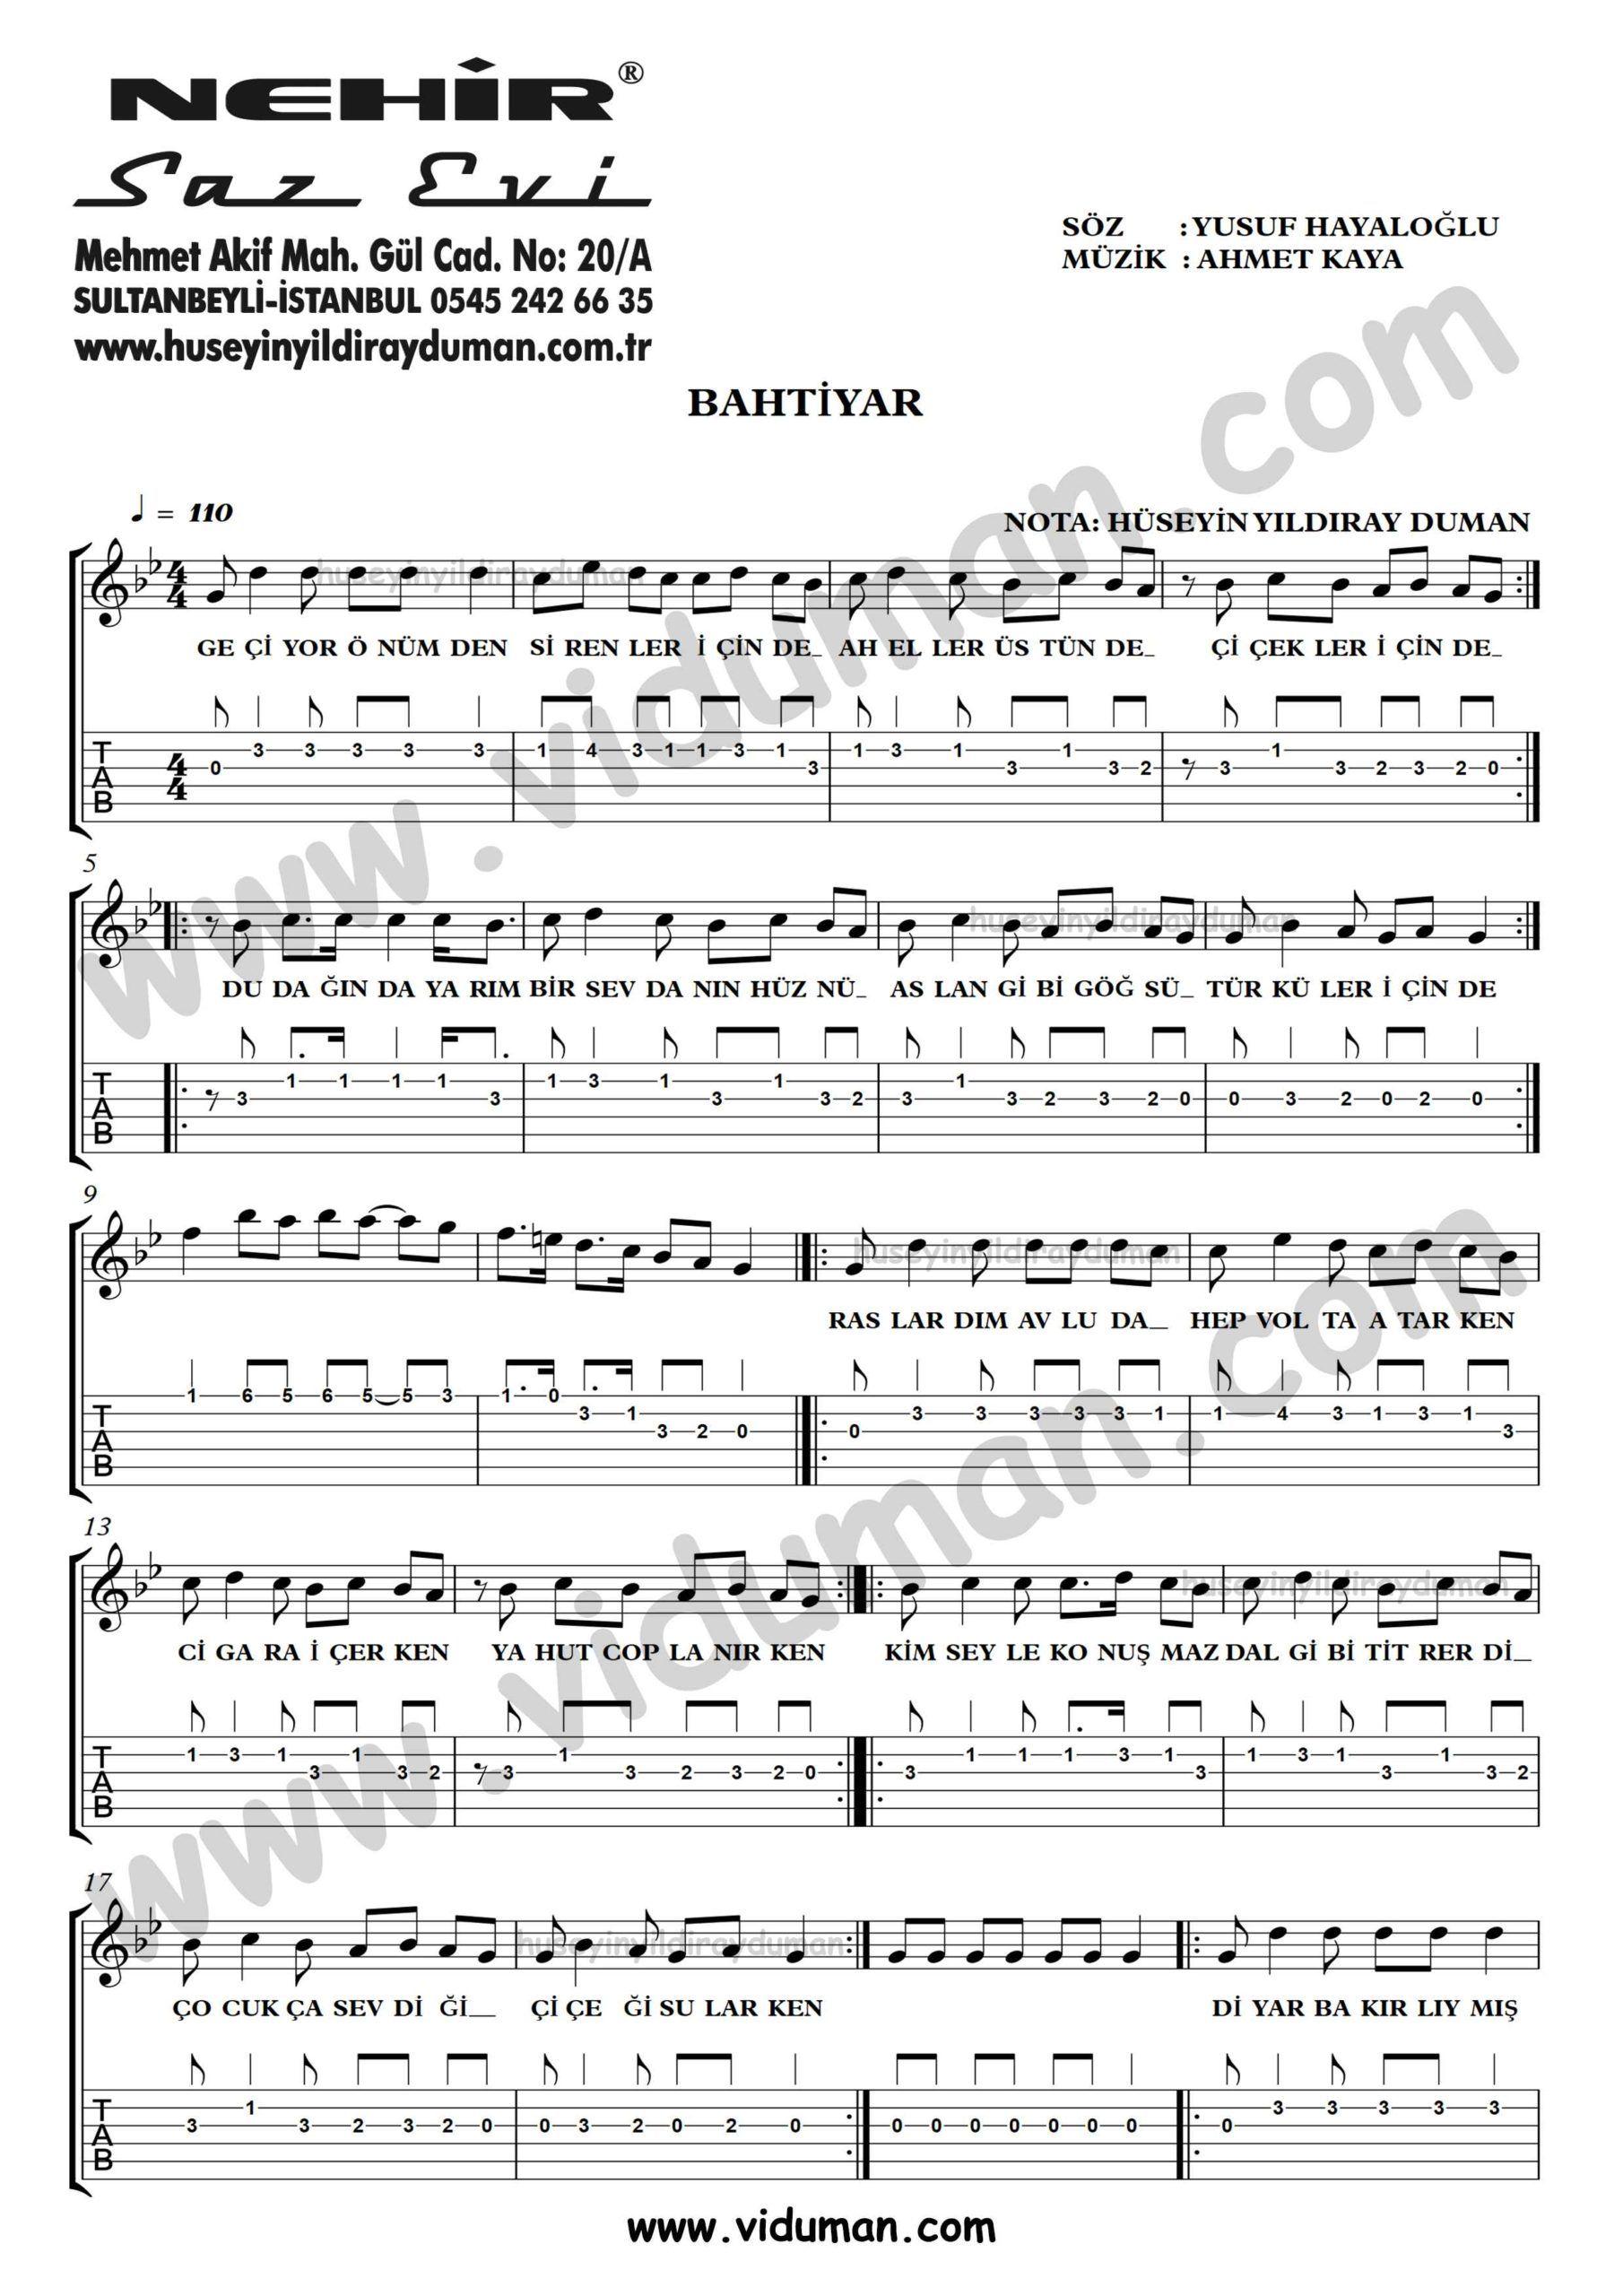 Bahtiyar Ahmet Kaya Gitar Tab Solo Notalari Gitar Martini Duman